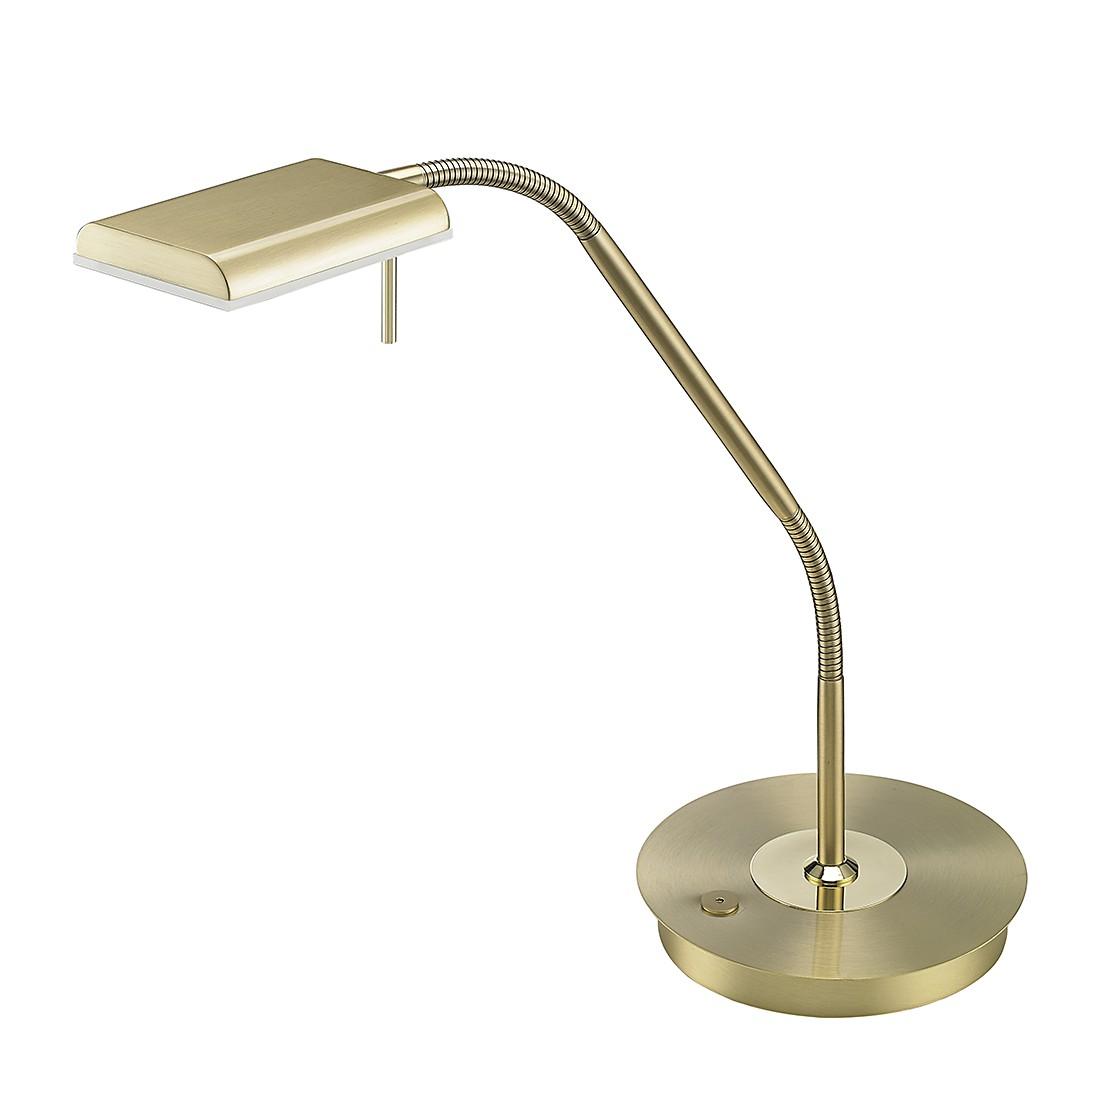 Tischleuchte Bergamo ● Metall ● 1-flammig- Sorpetaler A+